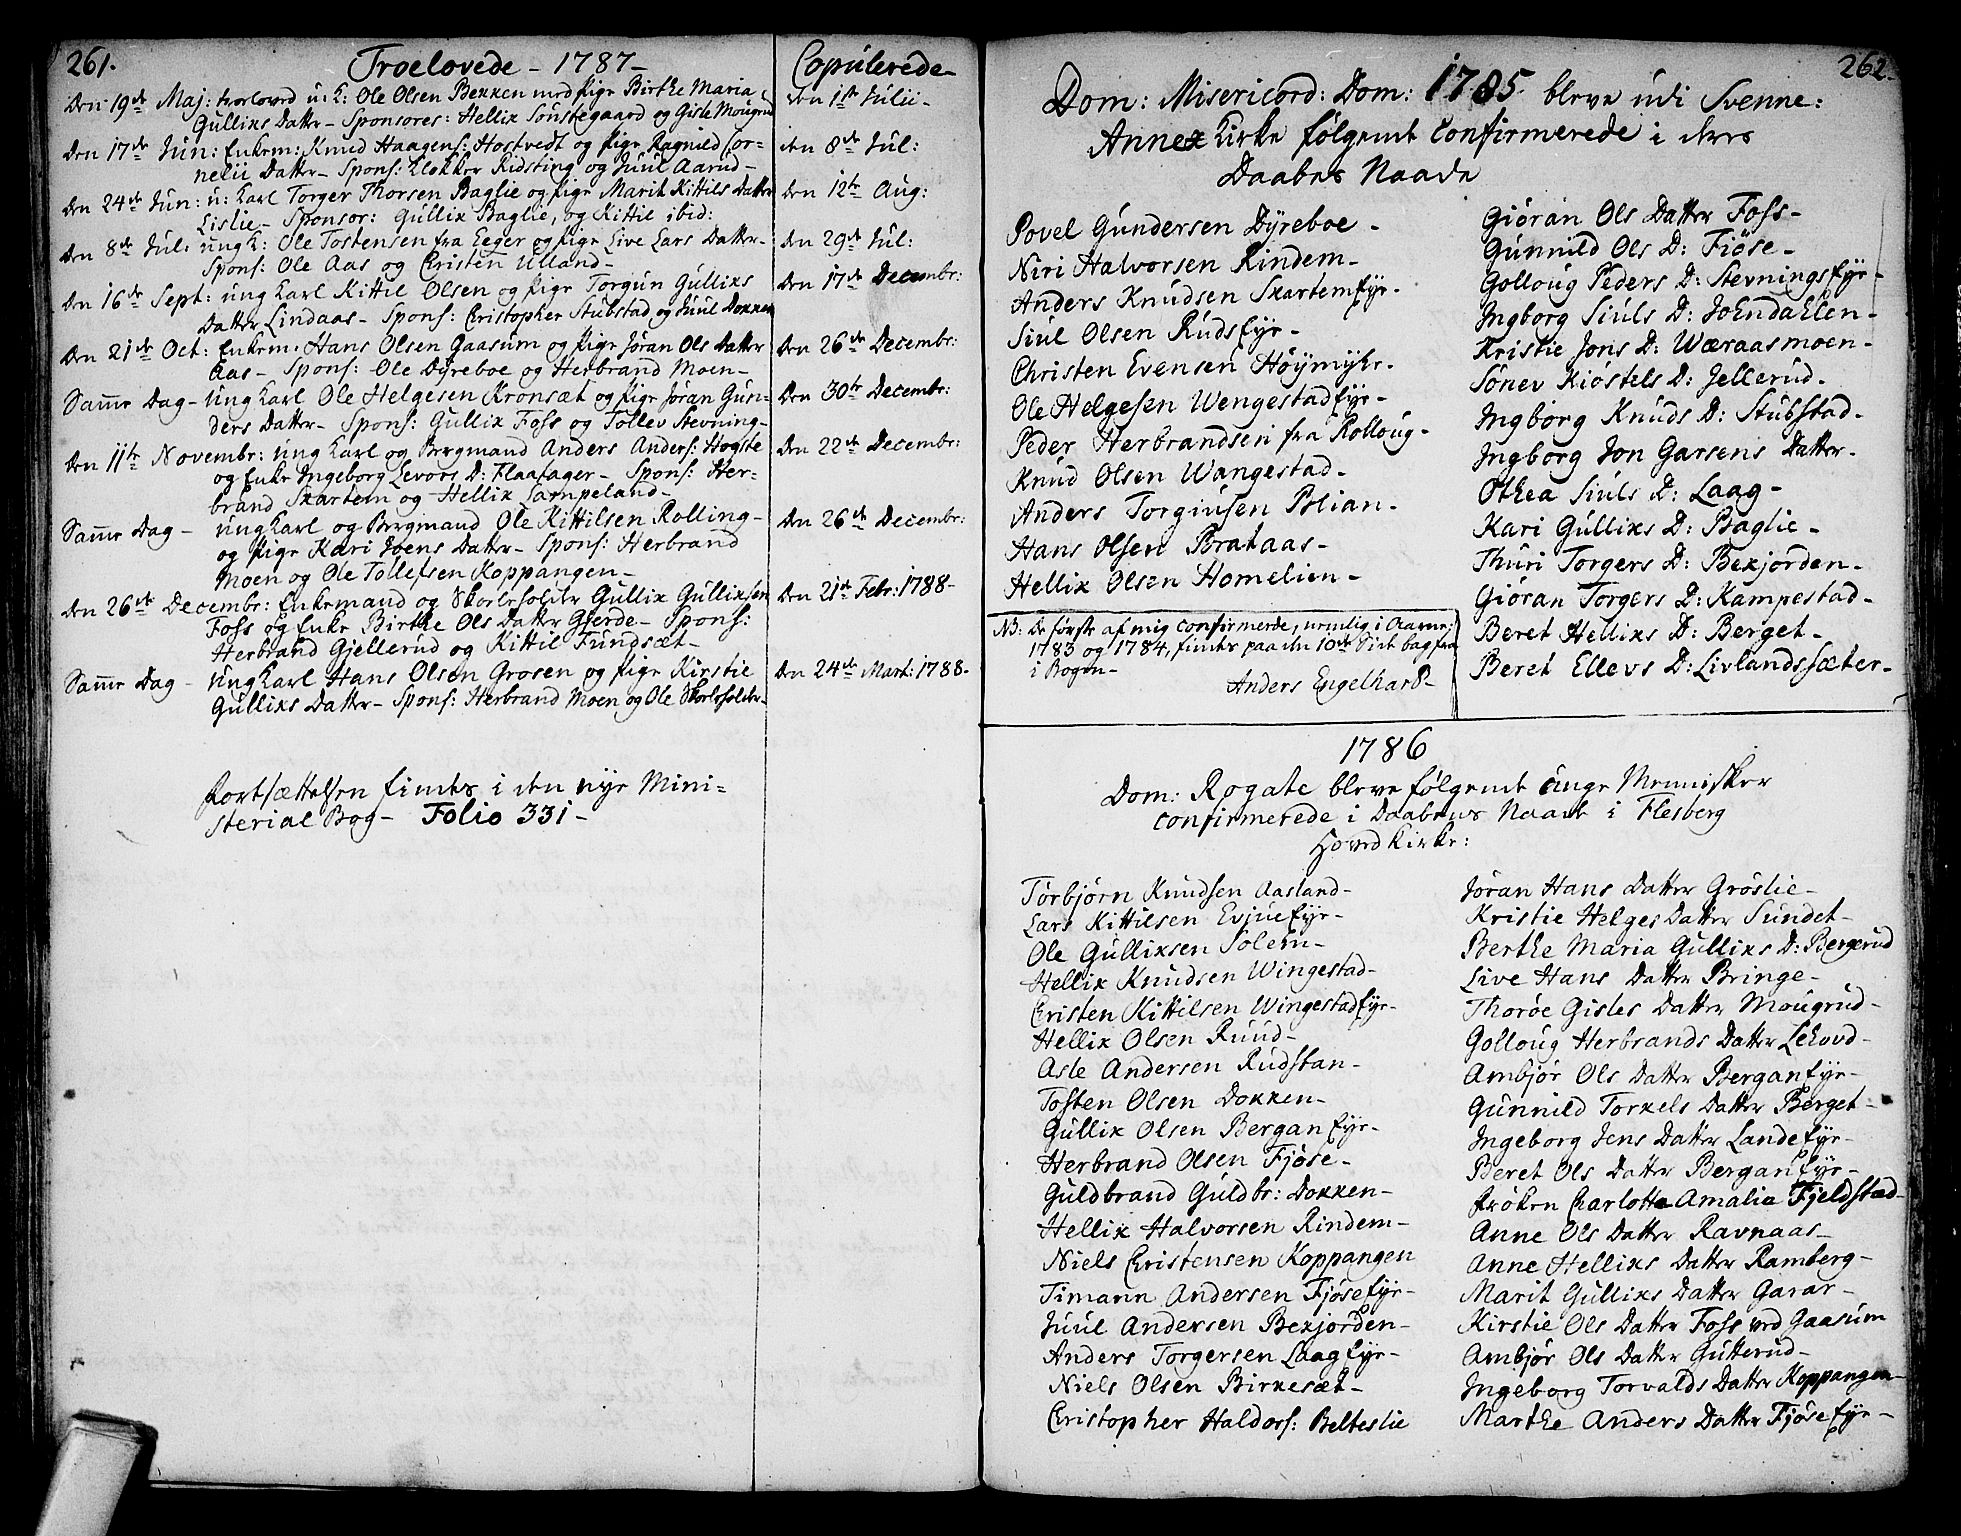 SAKO, Flesberg kirkebøker, F/Fa/L0003: Ministerialbok nr. I 3, 1748-1790, s. 261-262